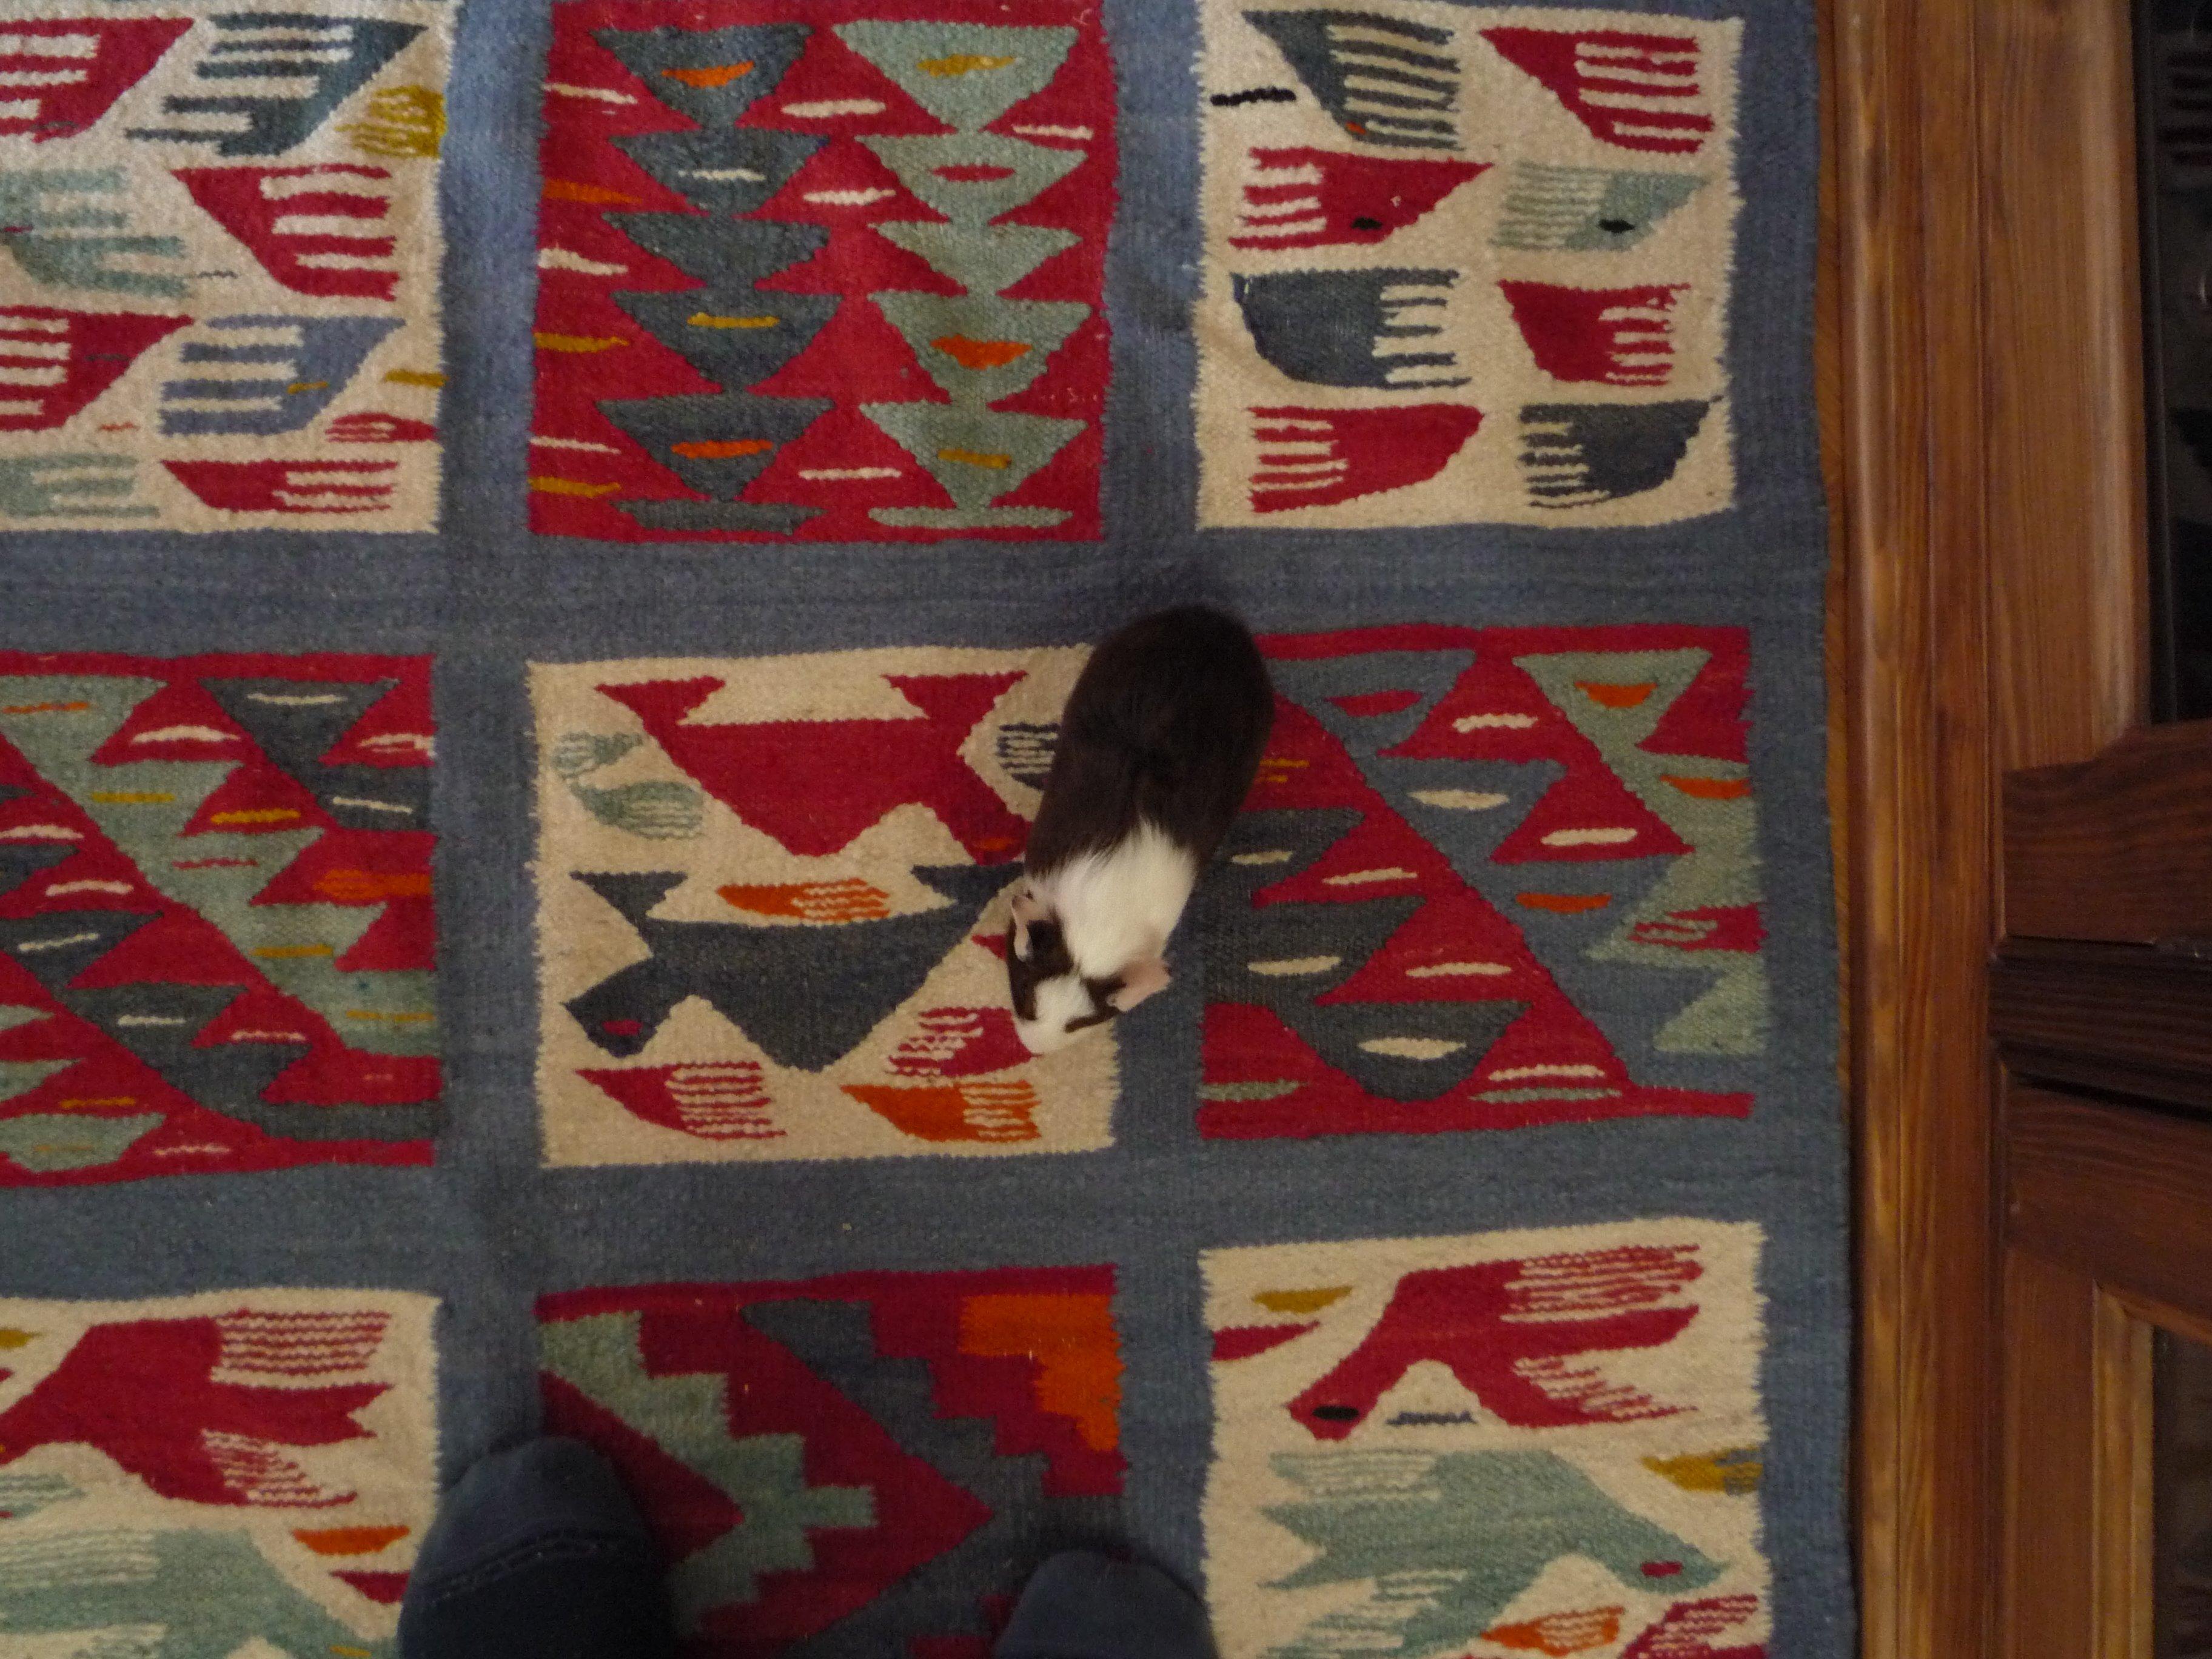 Gisèle promenade sur tapis berbère